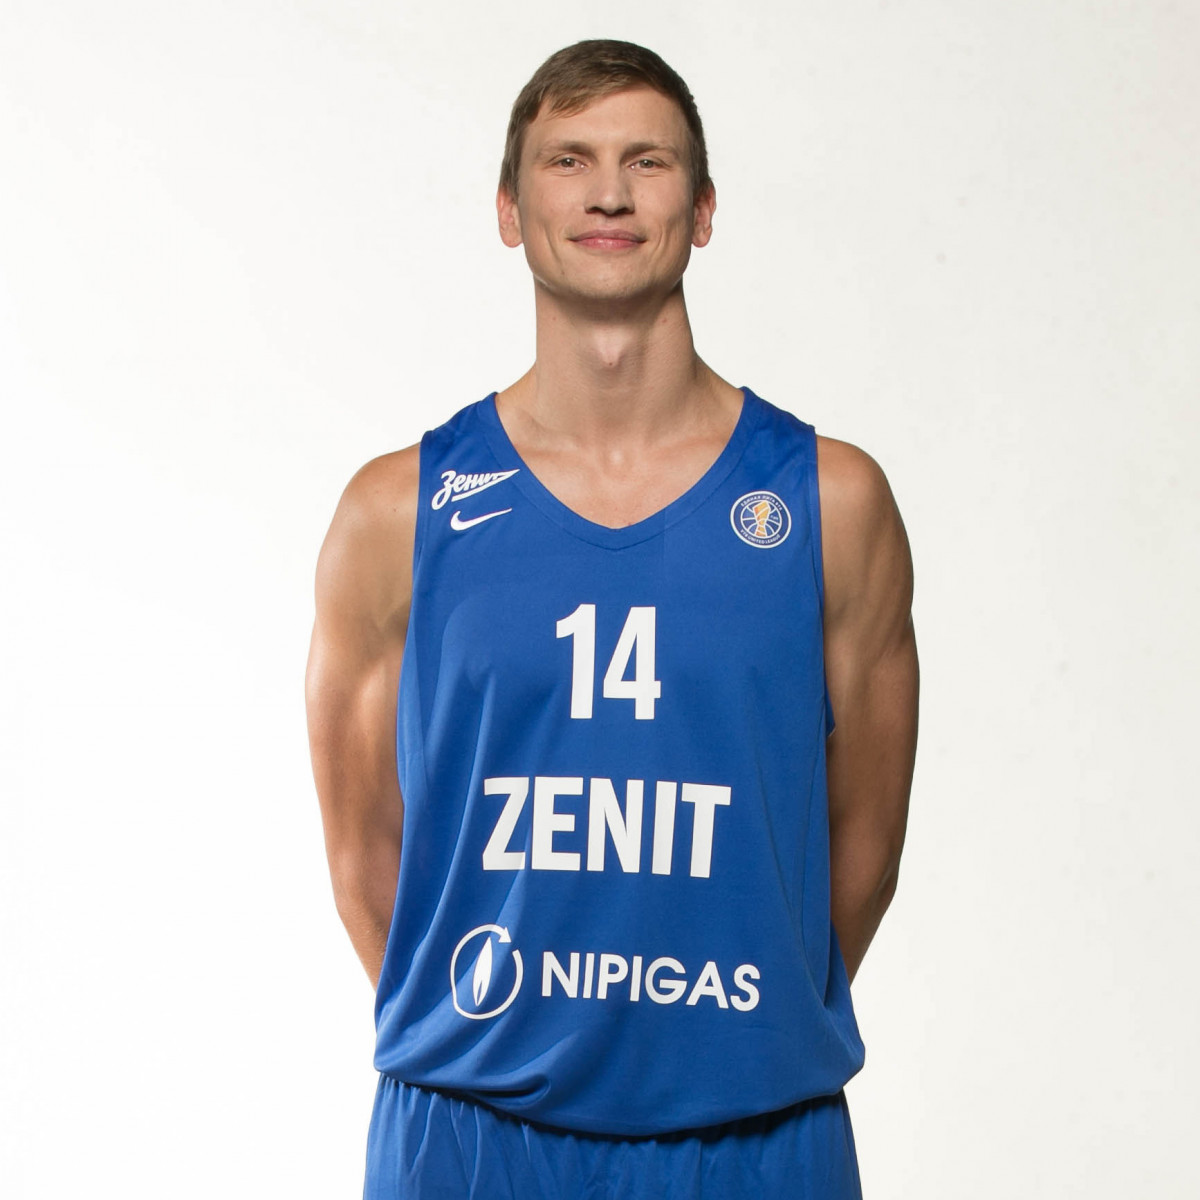 Photo of Anton Pushkov, 2018-2019 season